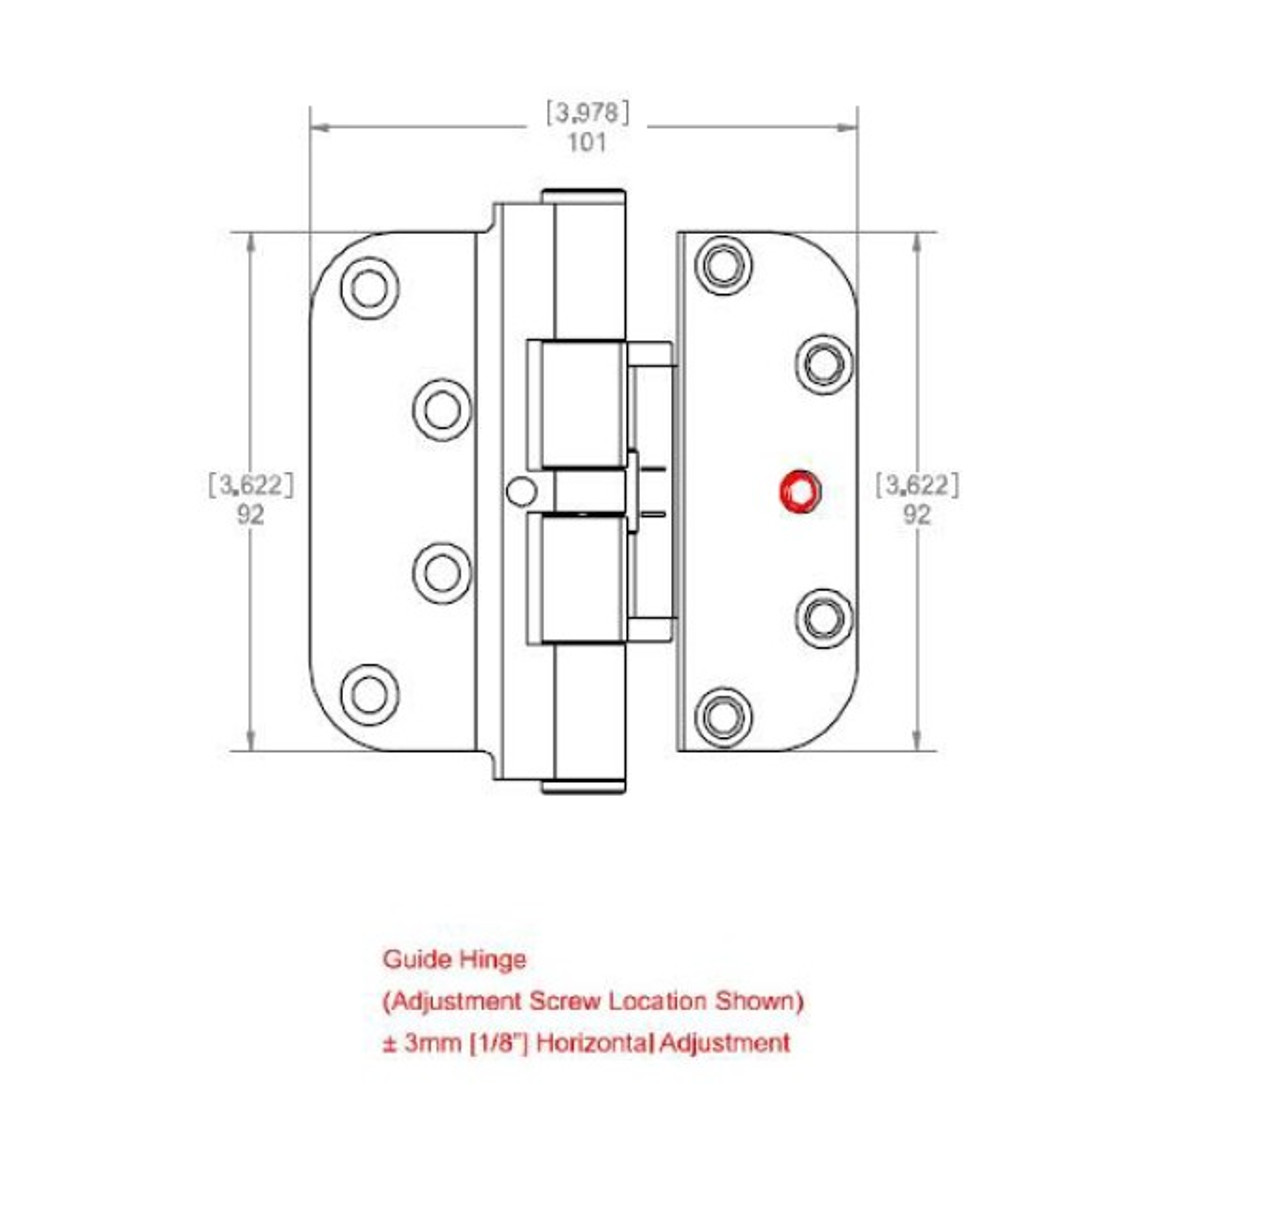 Hoppe adjustable GUIDE hinge for swing door